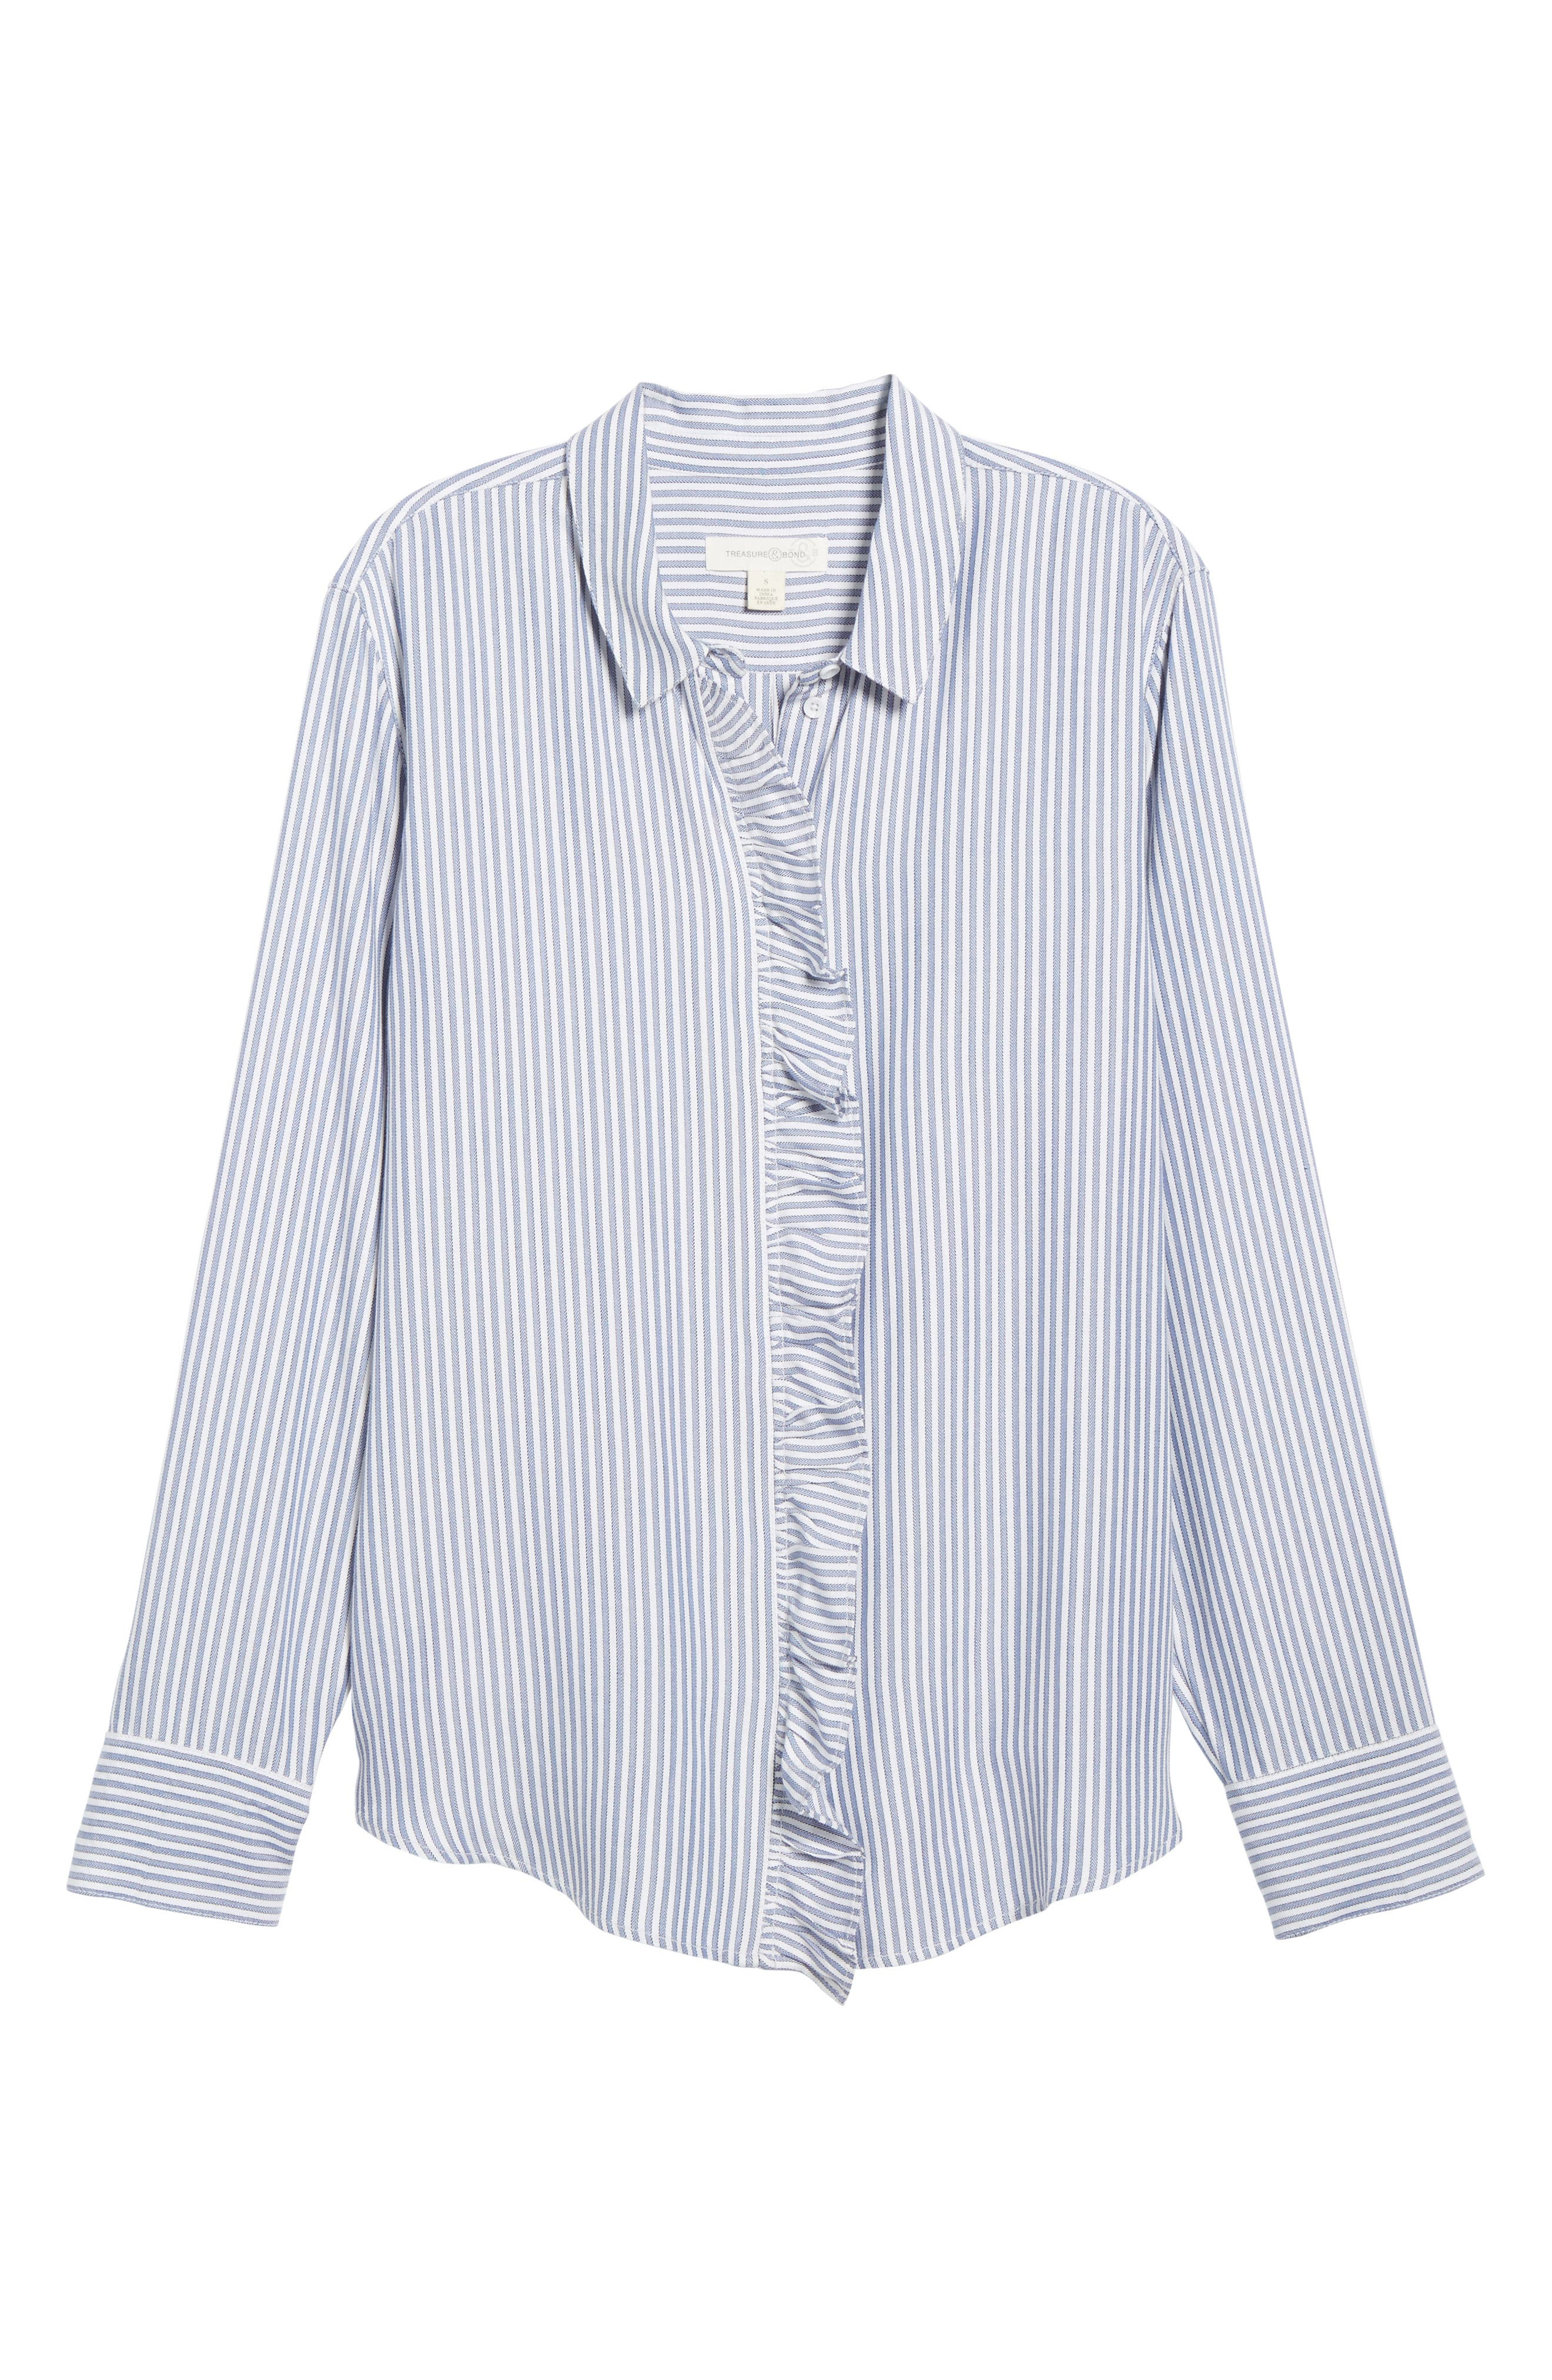 Stripe Ruffle Shirt,                             Alternate thumbnail 6, color,                             100